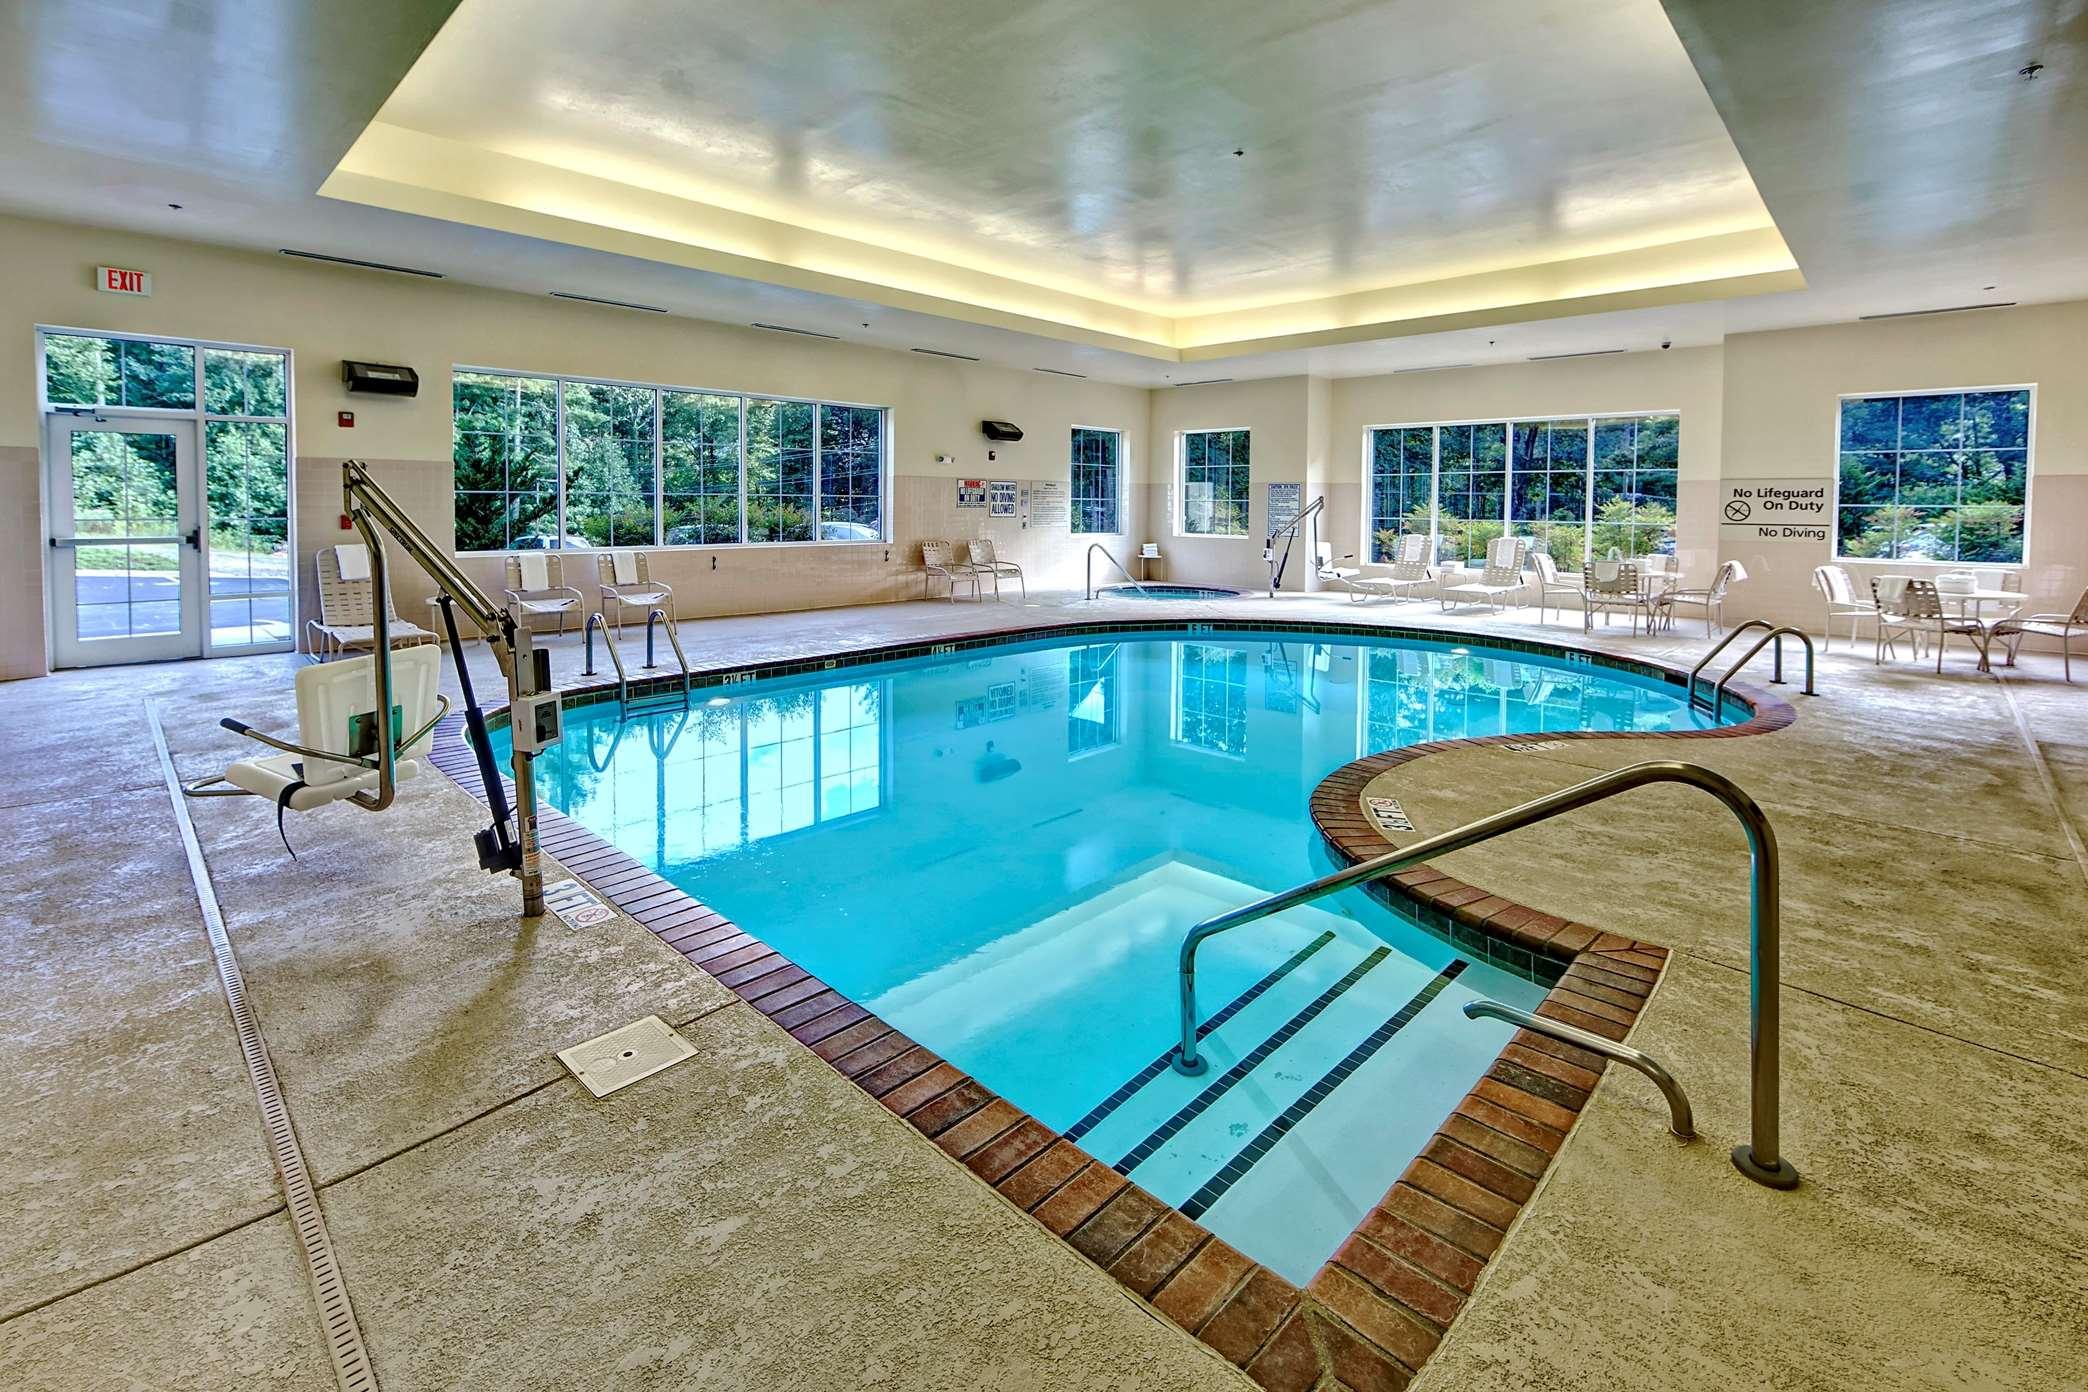 Hampton Inn & Suites Cashiers-Sapphire Valley image 33